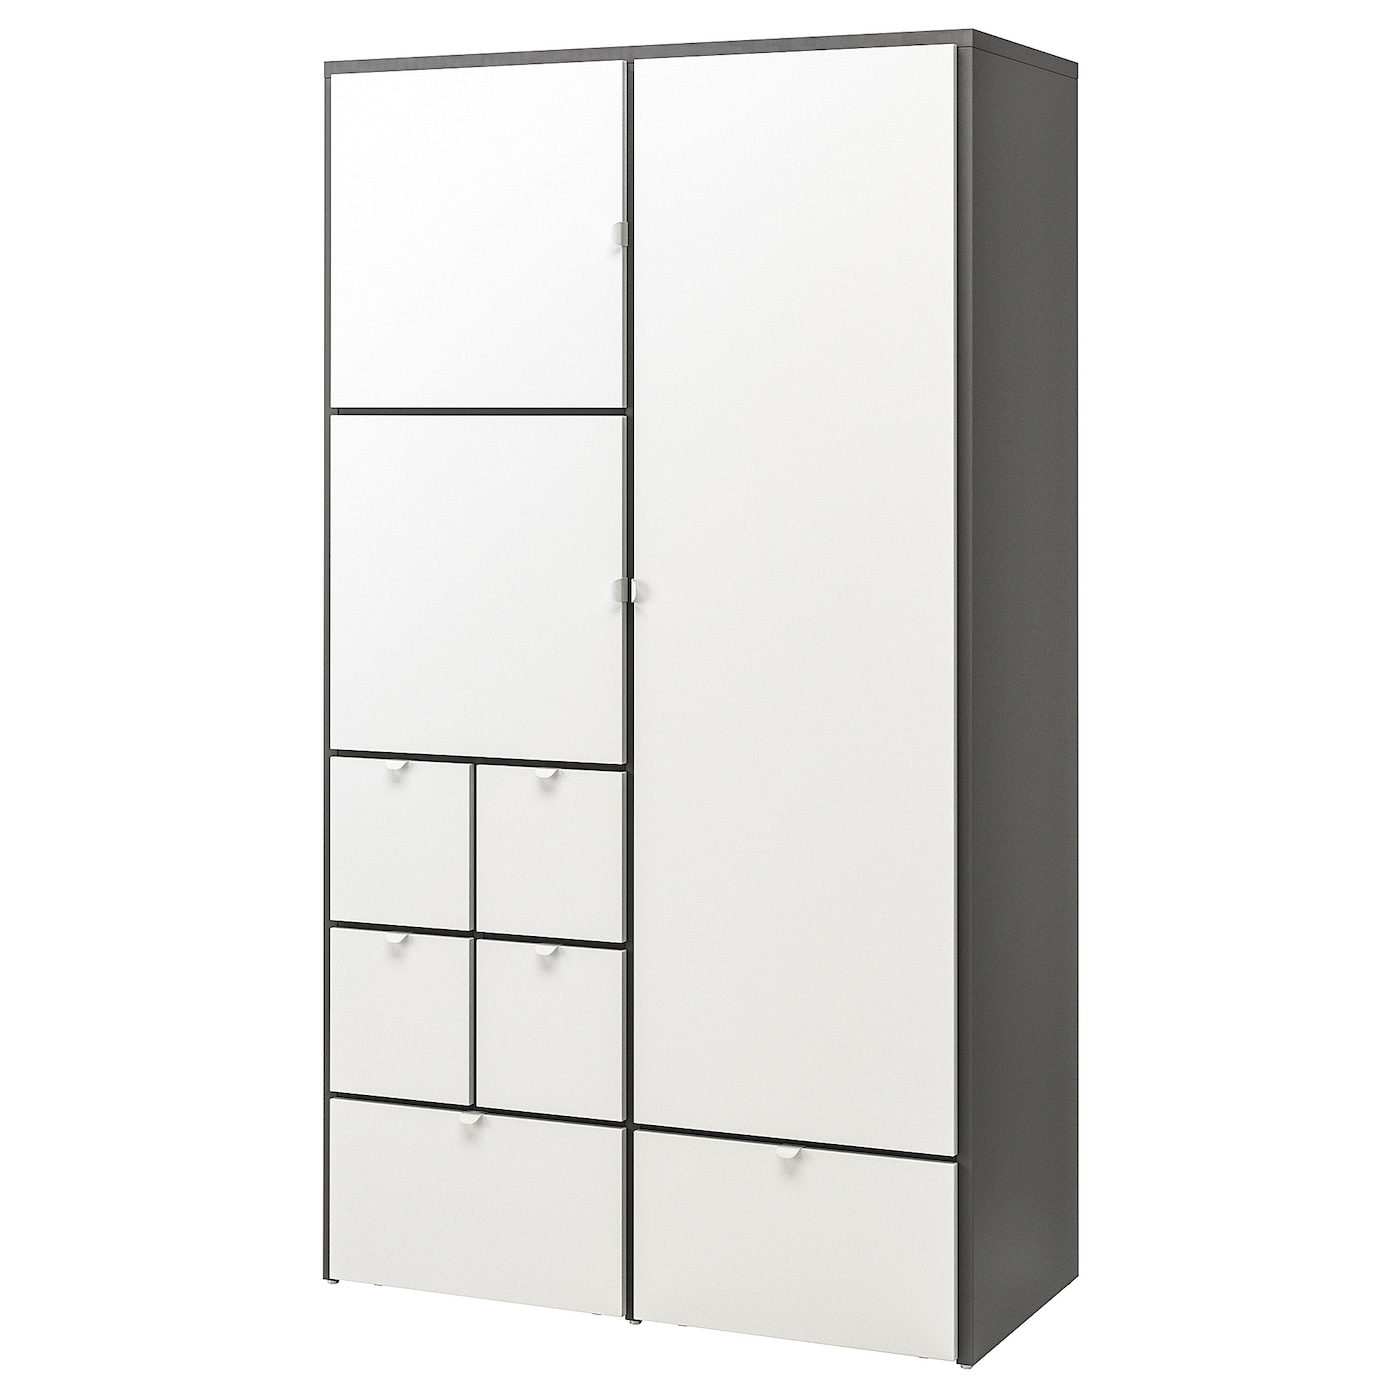 Visthus Armario Gris Blanco 122 X 59 X 216 Cm Ikea